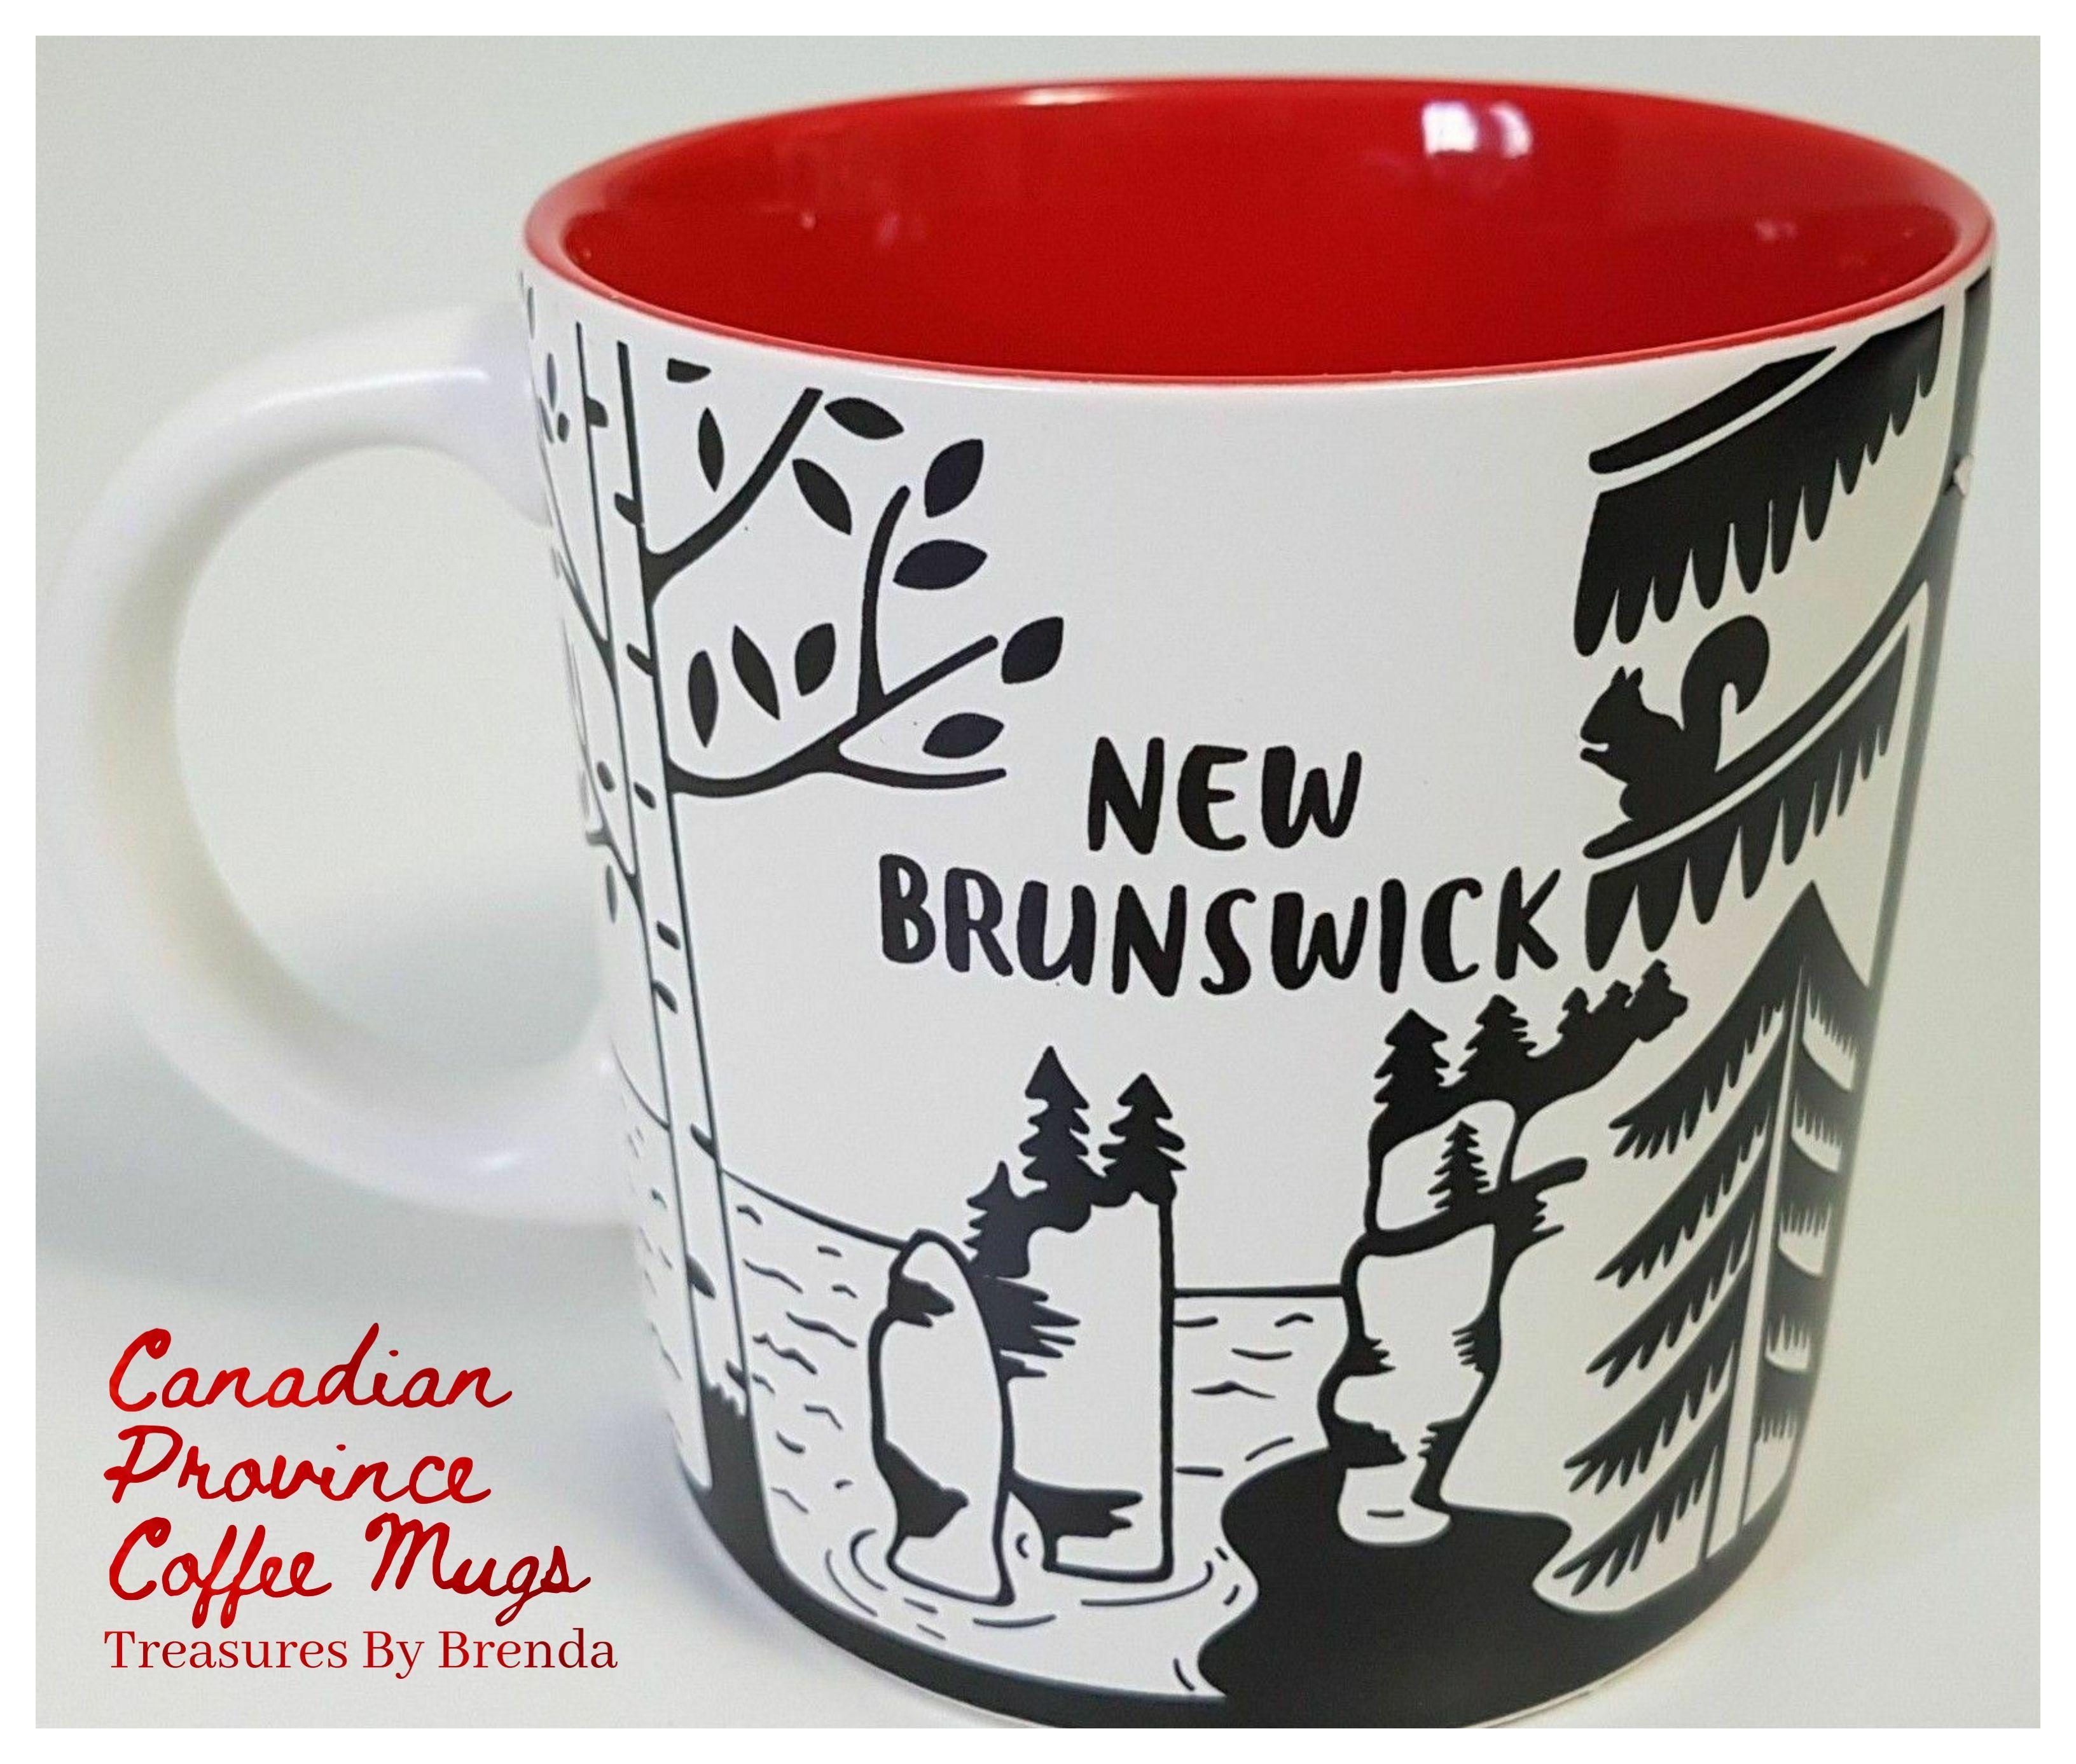 Canadian Province Coffee Mugs New Brunswick in 2020